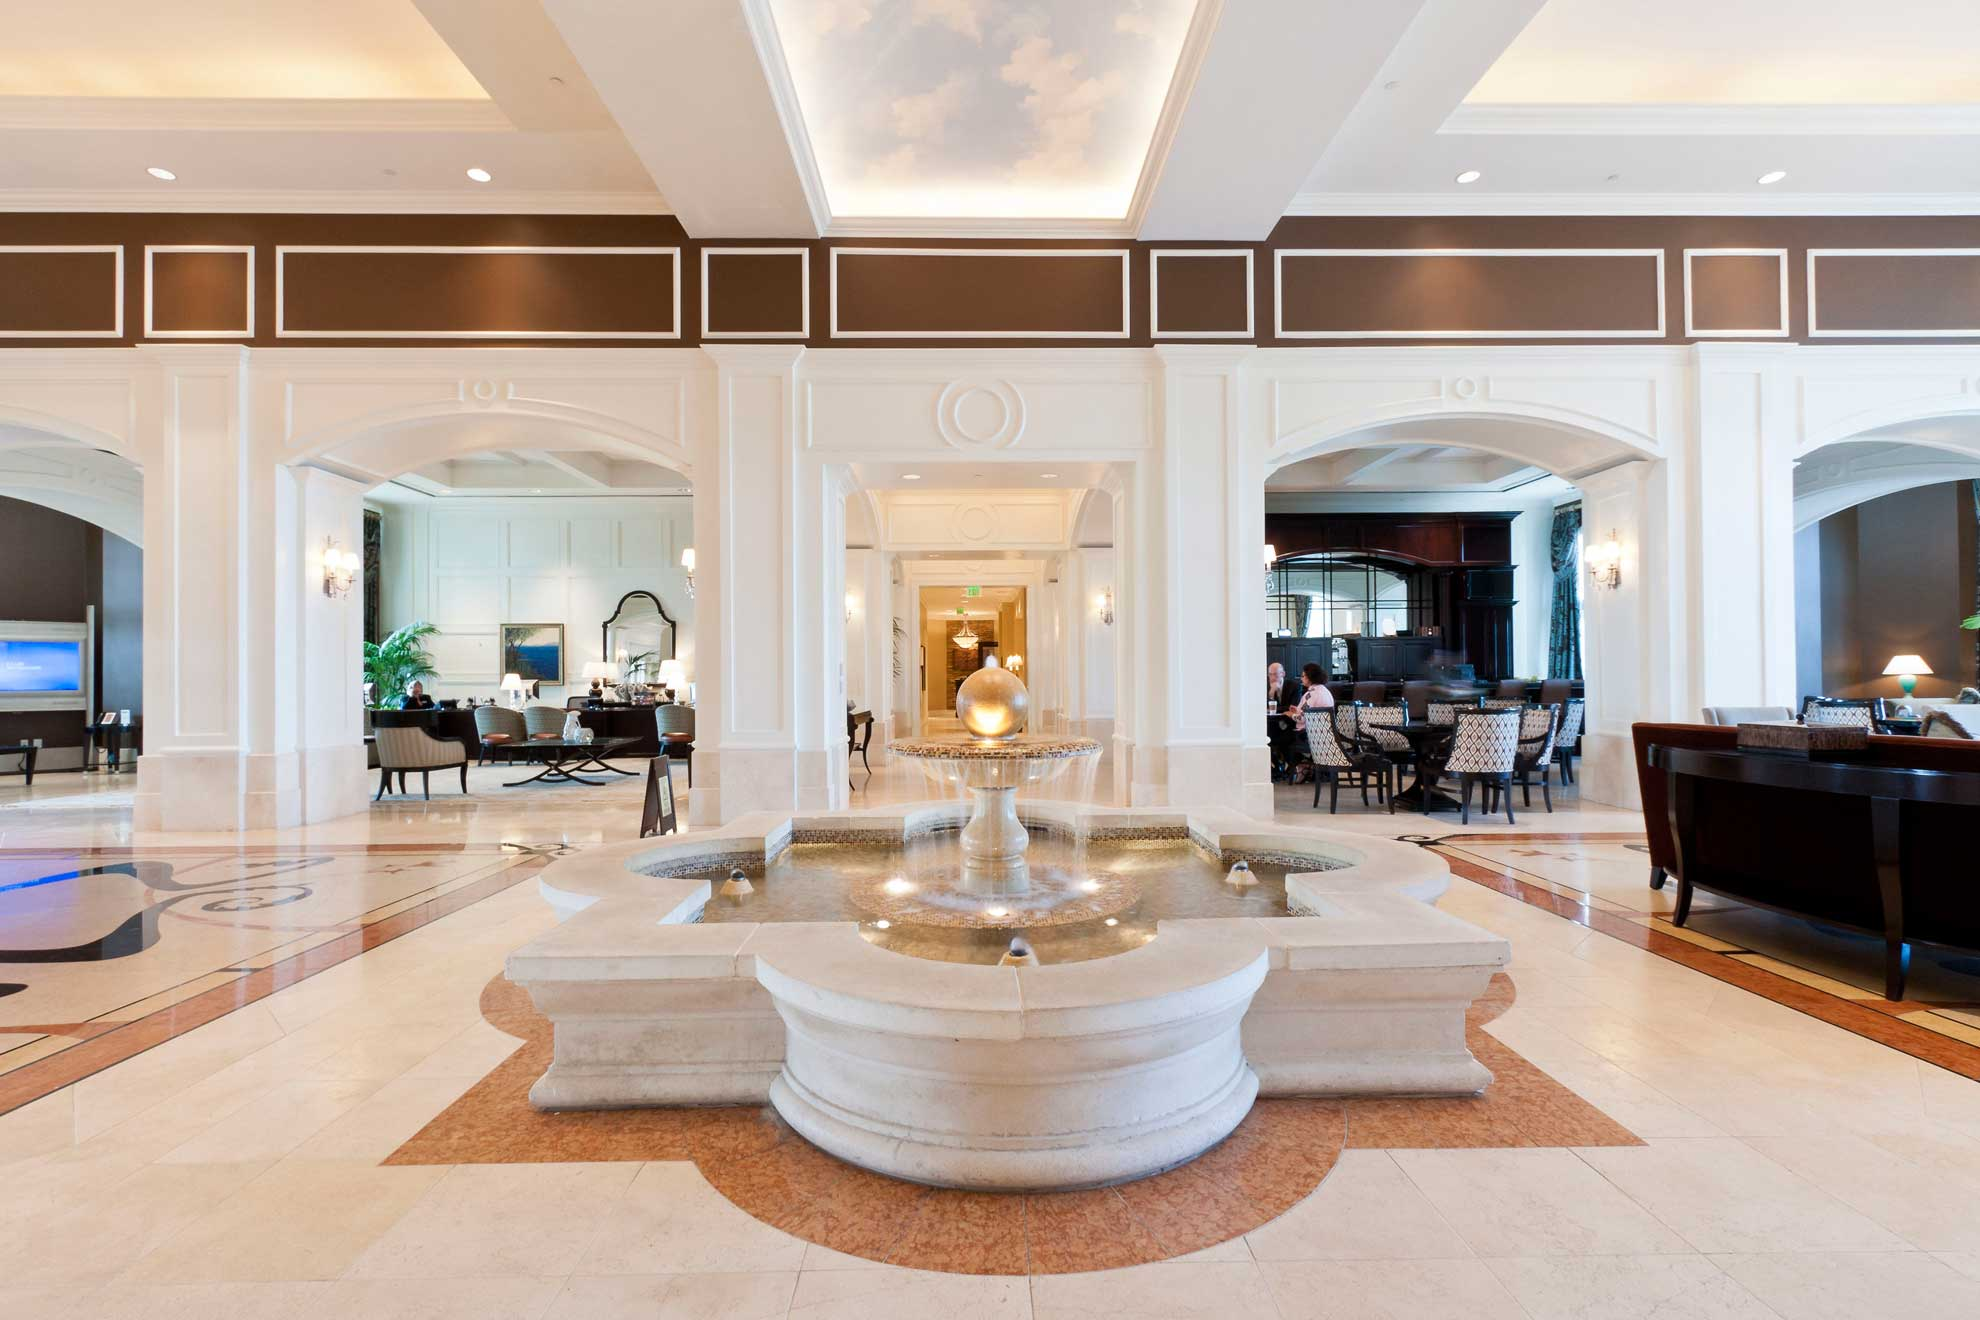 Grande Lobby at Reunion Resort